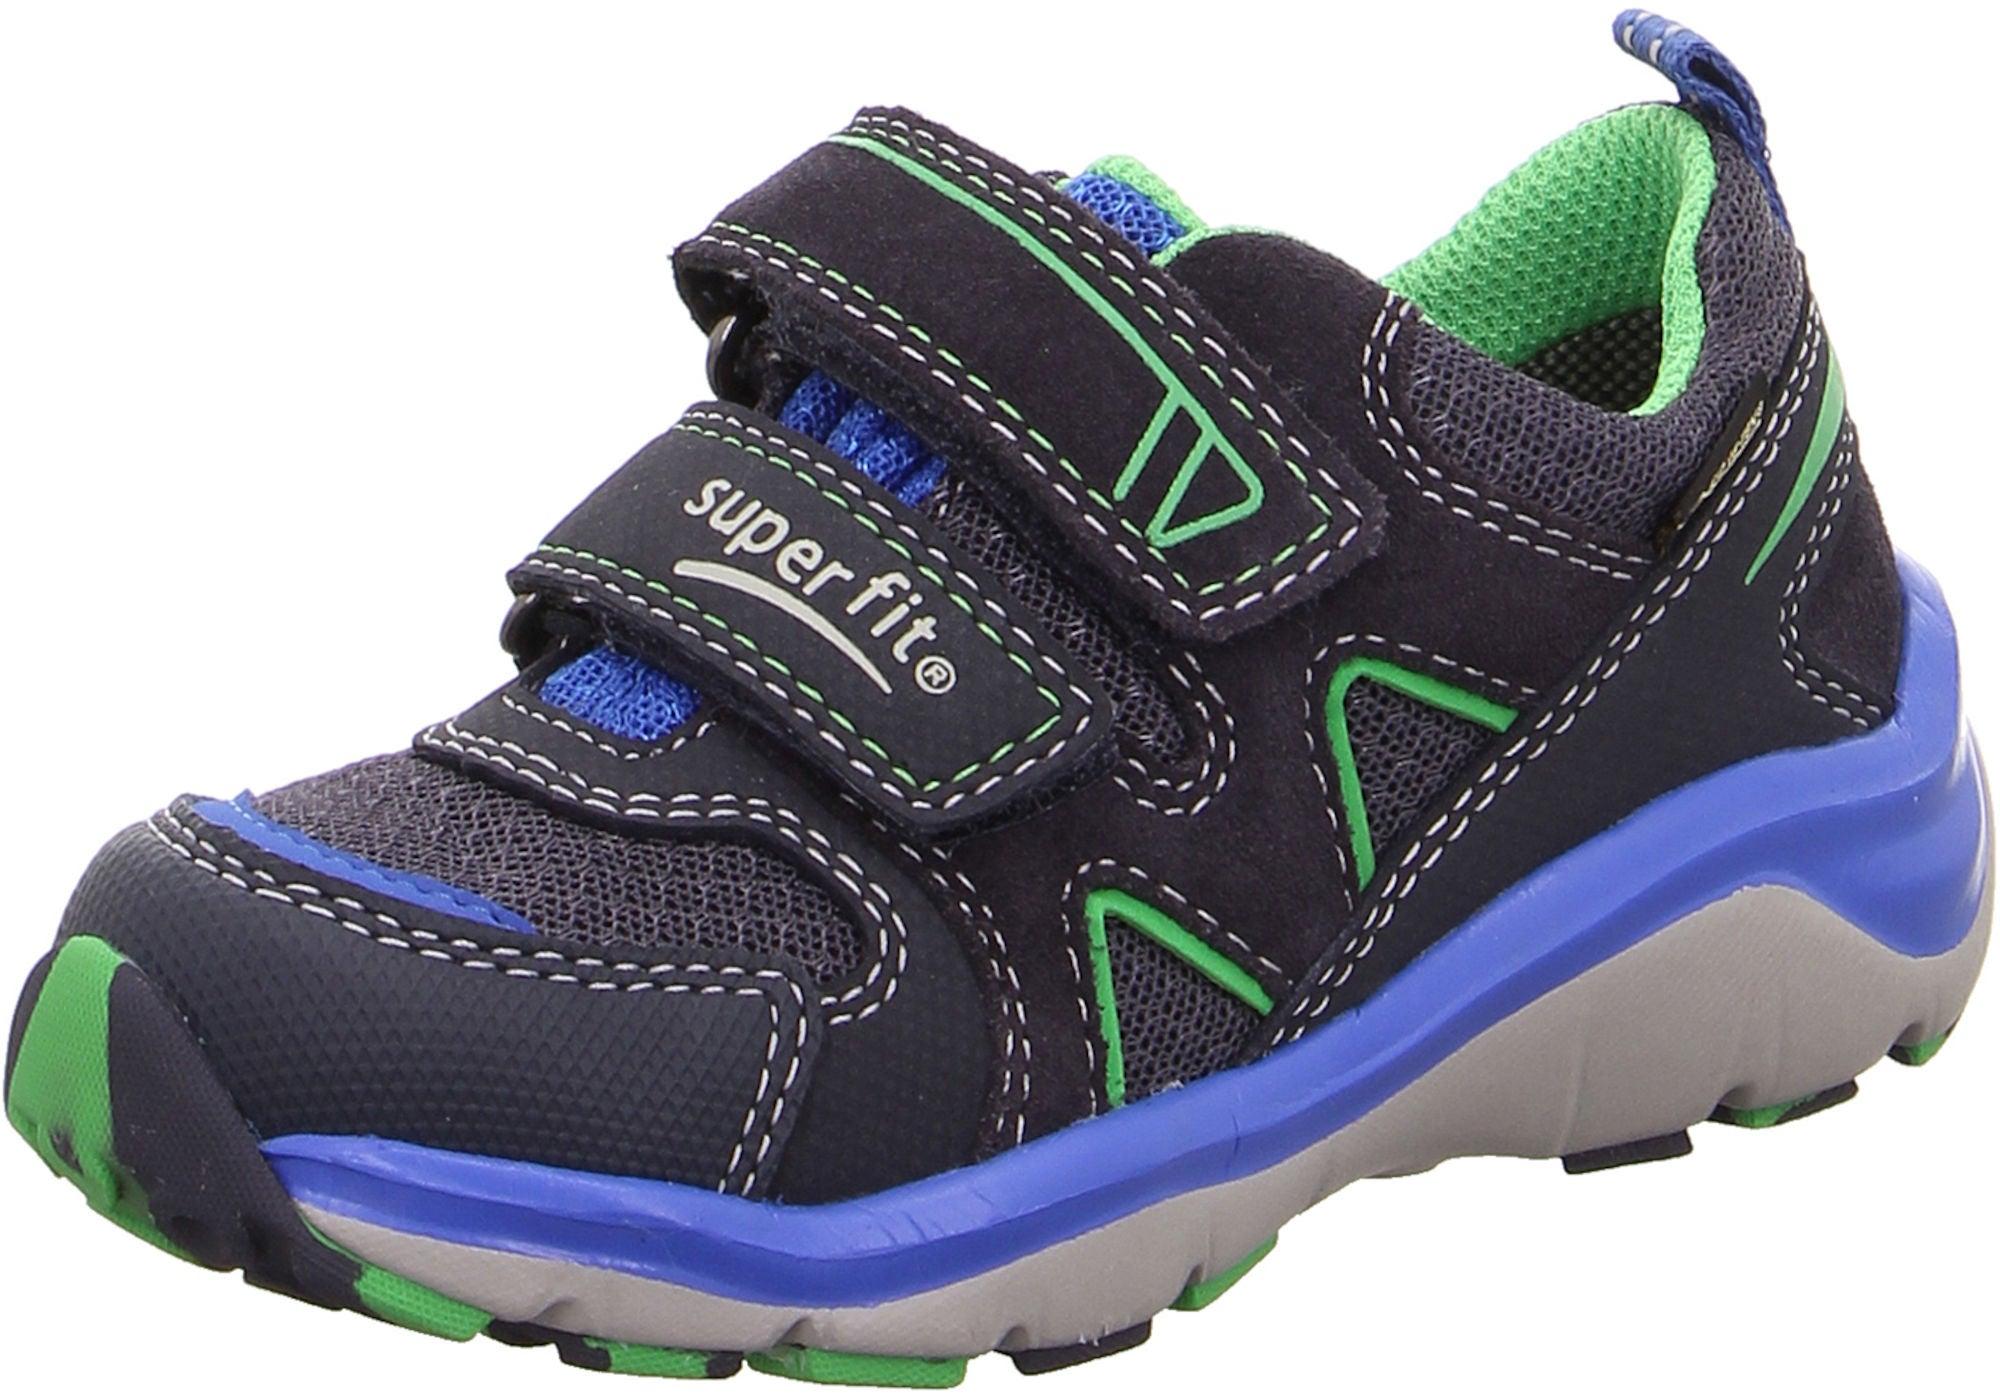 464414b9ebf Köp Superfit Sport5 GORE-TEX Sneaker, Blue/Green | Jollyroom